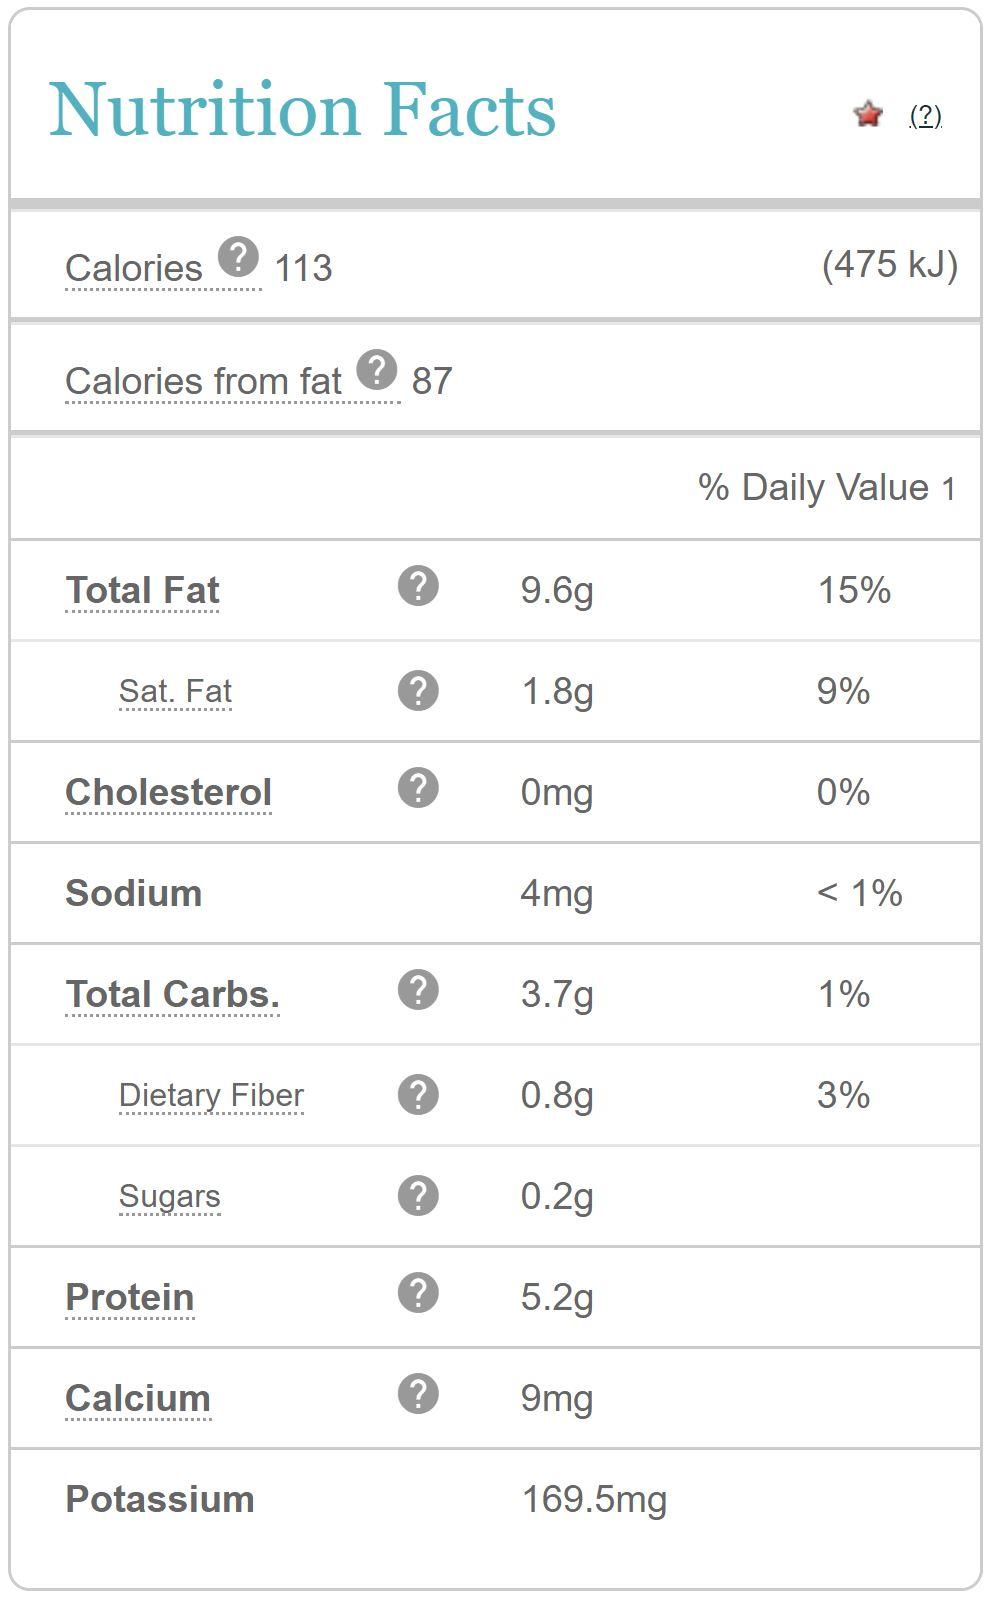 image from  www.calorieking.com